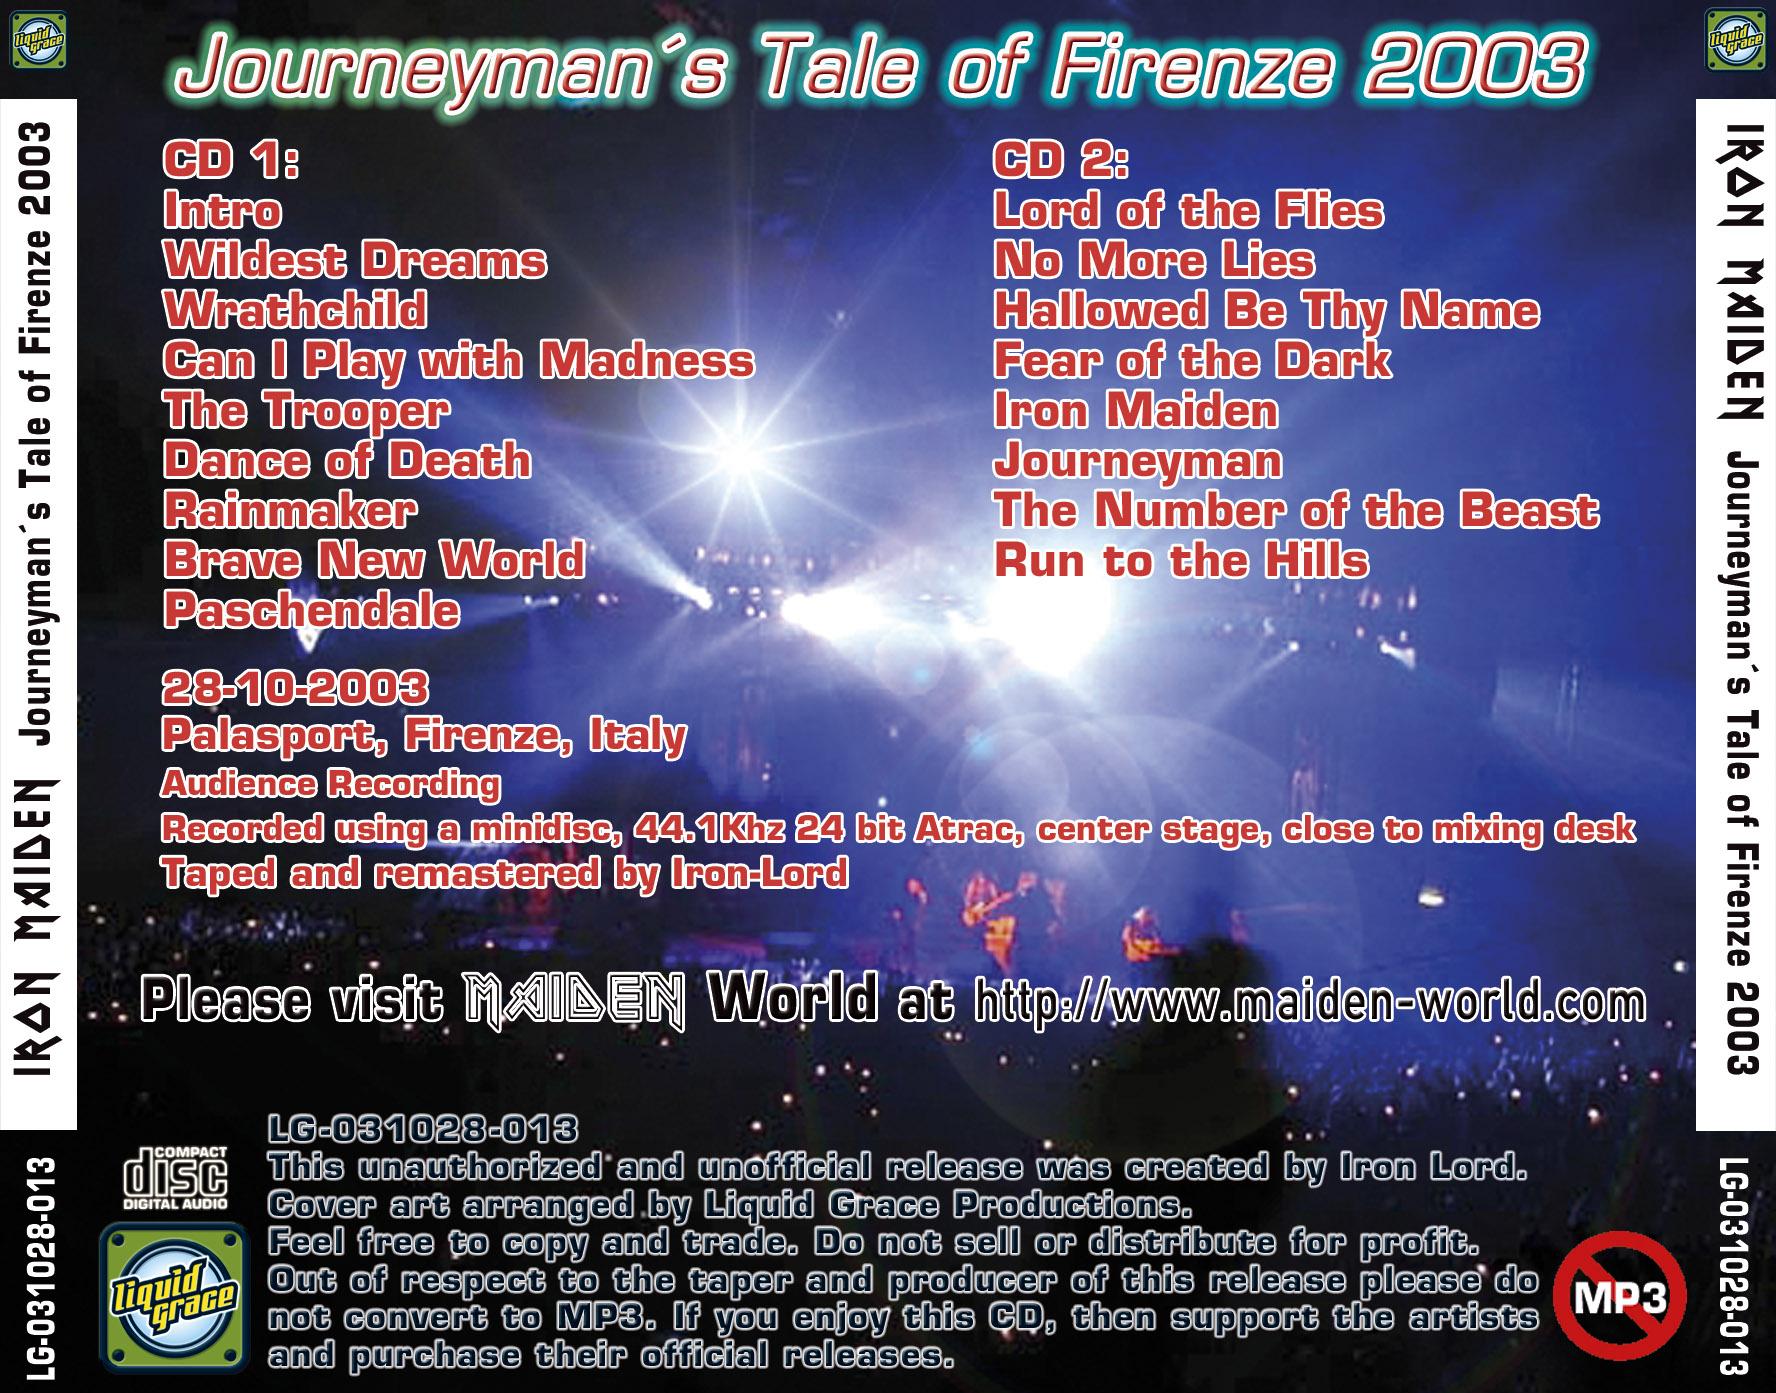 Iron Maiden Bootlegs - Journeyman's Tale of Firenze 2003